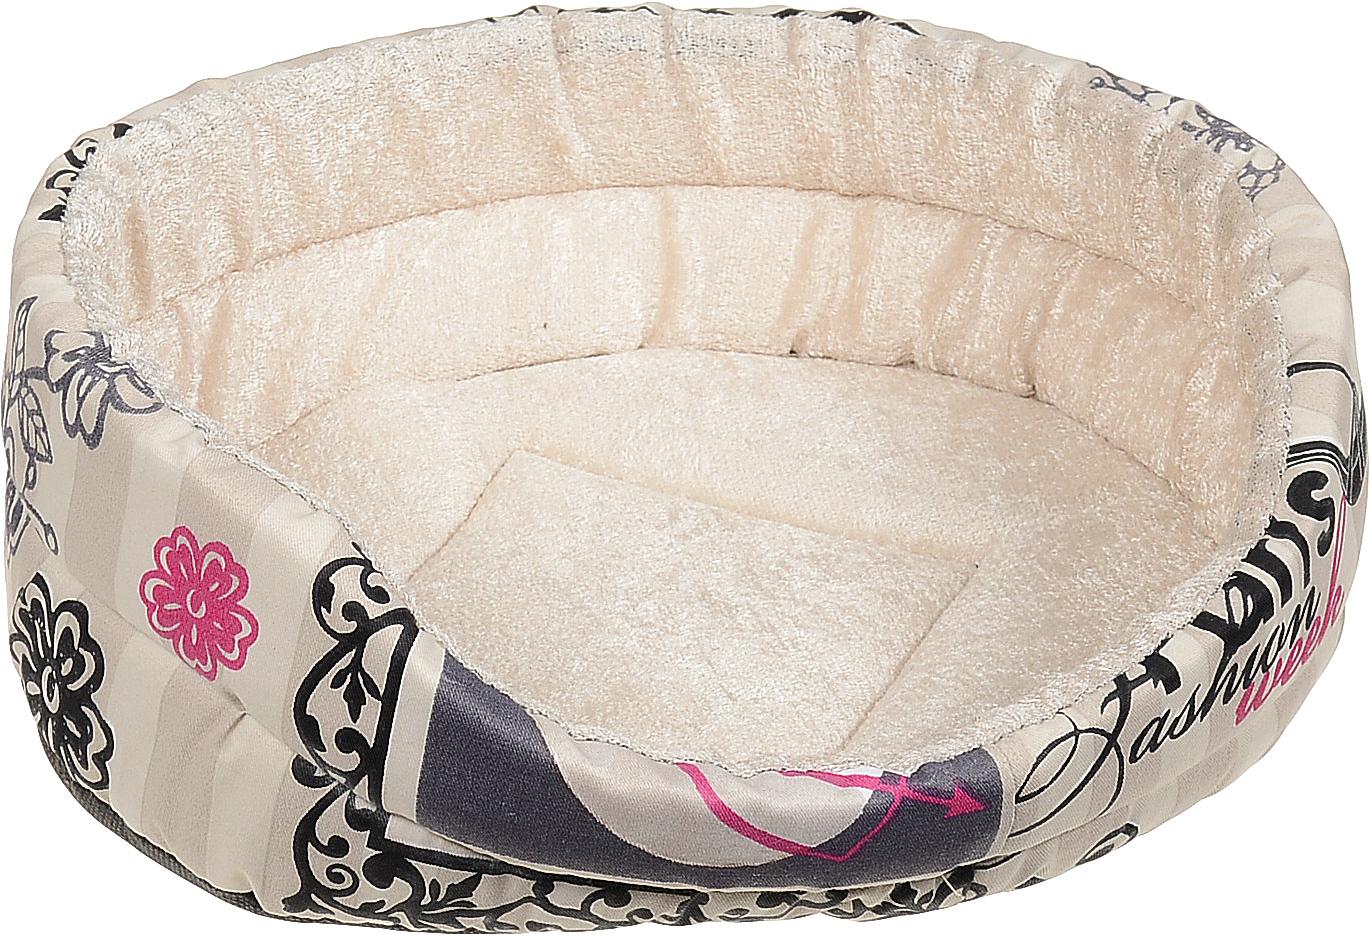 Лежак для собак GLG Малютка, цвет: бежевый, 37 х 30 х 11 см мягкий сон